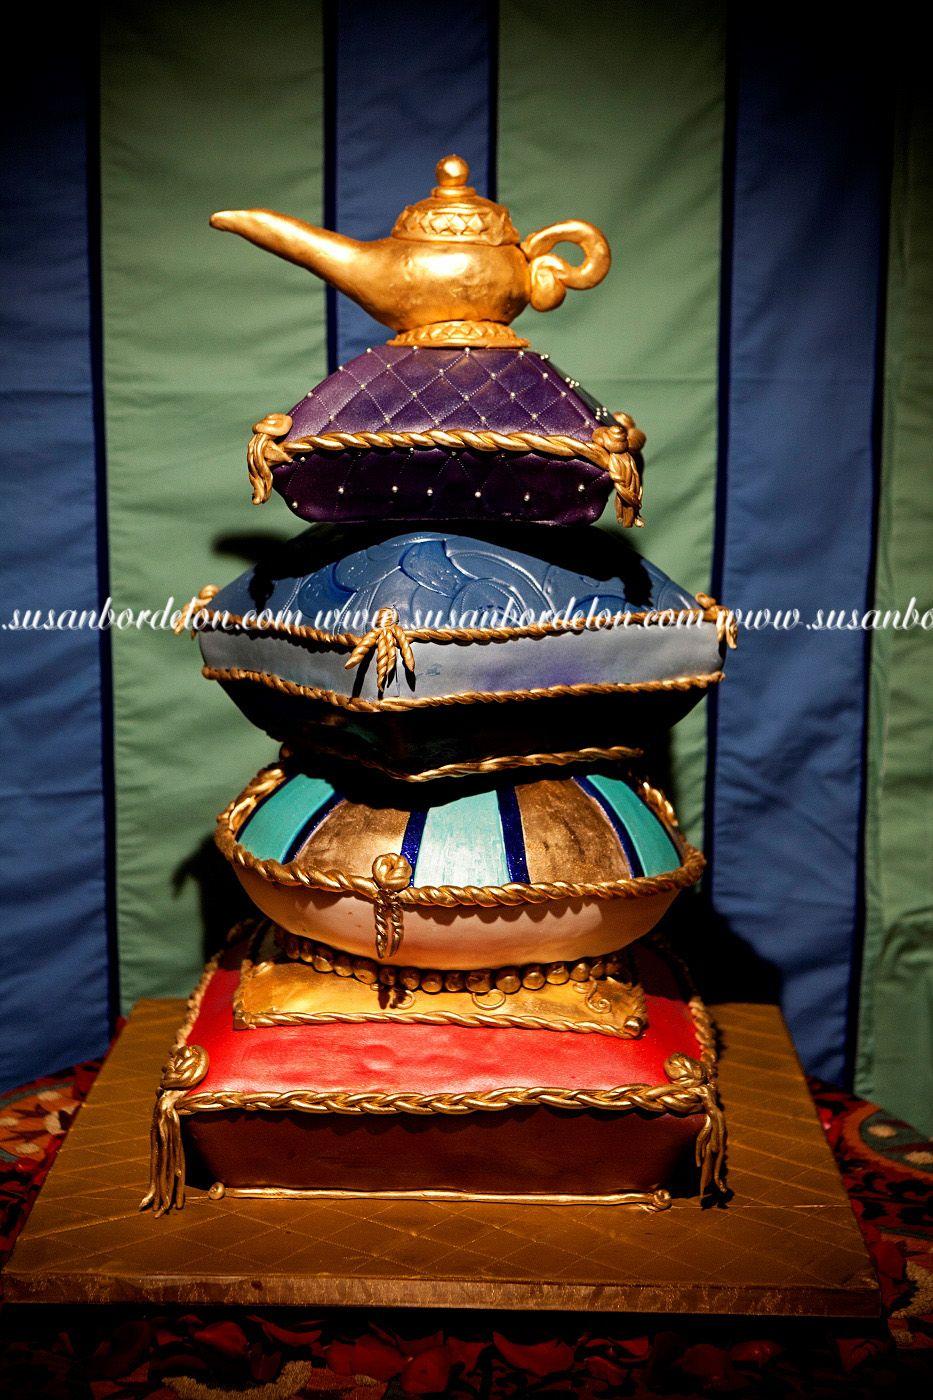 arabian nights themed wedding cake weddings weddings weddings pinterest 1001 nuits et nuit. Black Bedroom Furniture Sets. Home Design Ideas